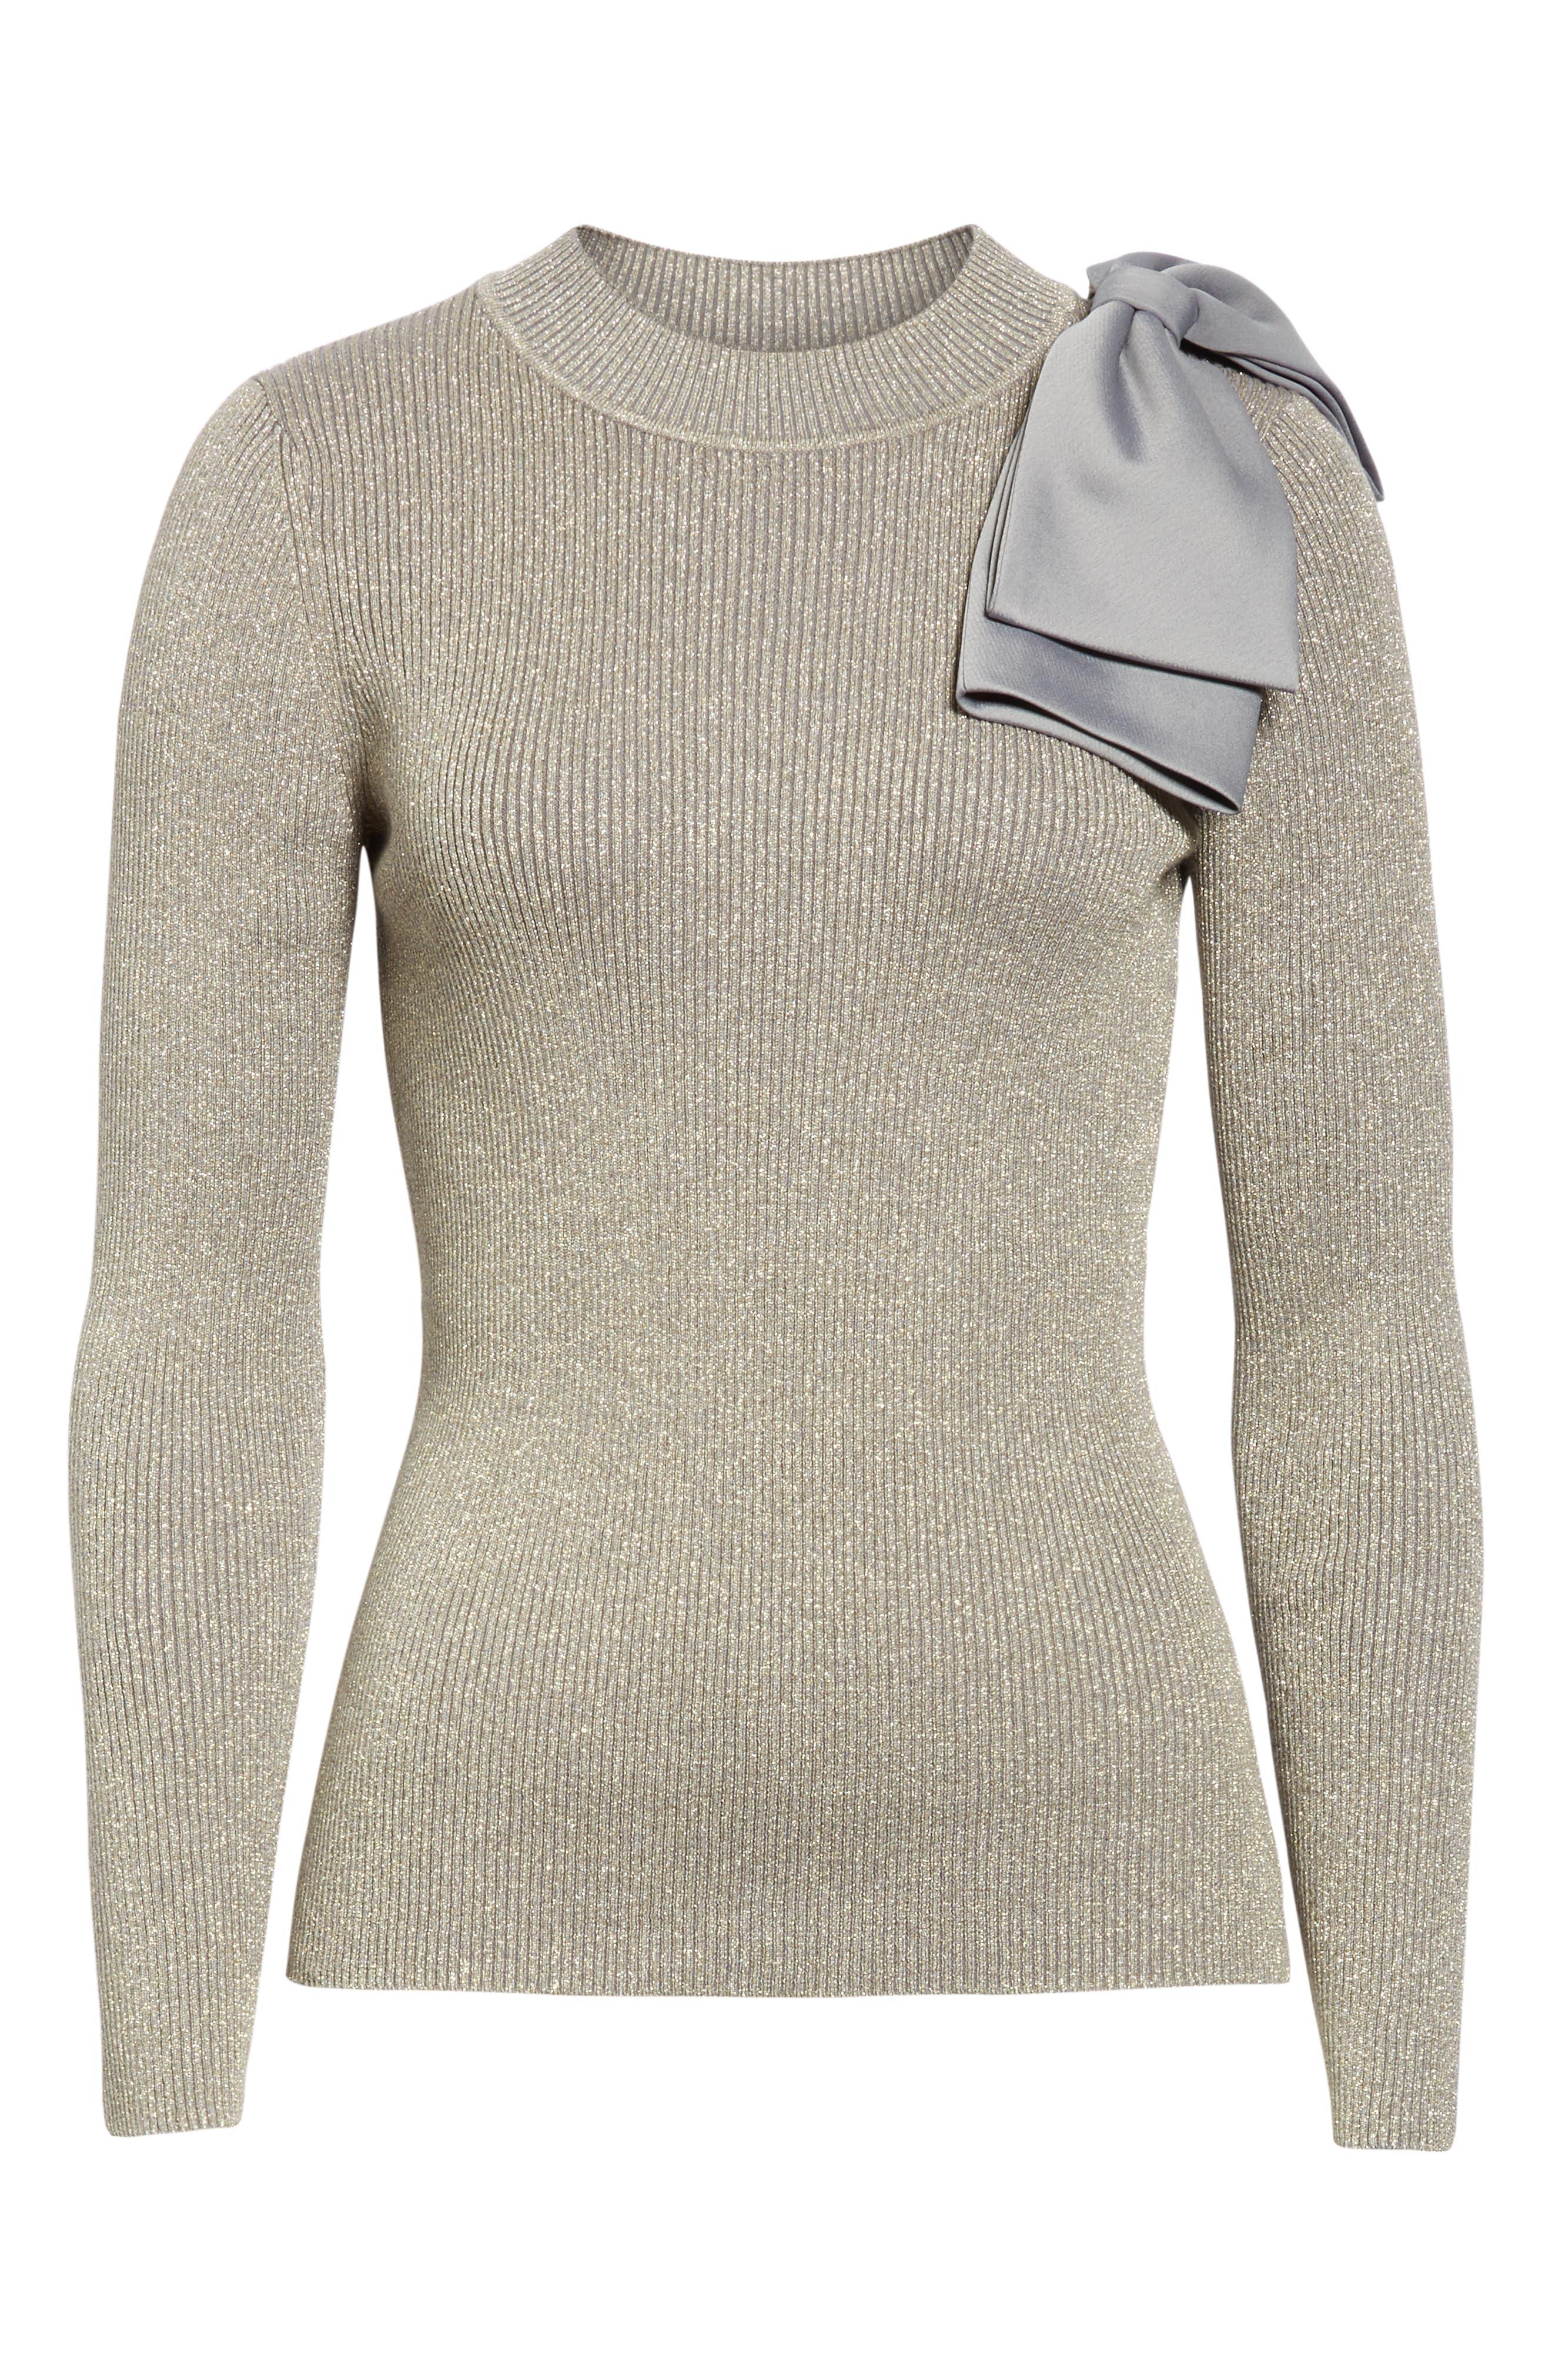 Saaydie Bow Trim Metallic Sweater,                             Alternate thumbnail 6, color,                             CHARCOAL